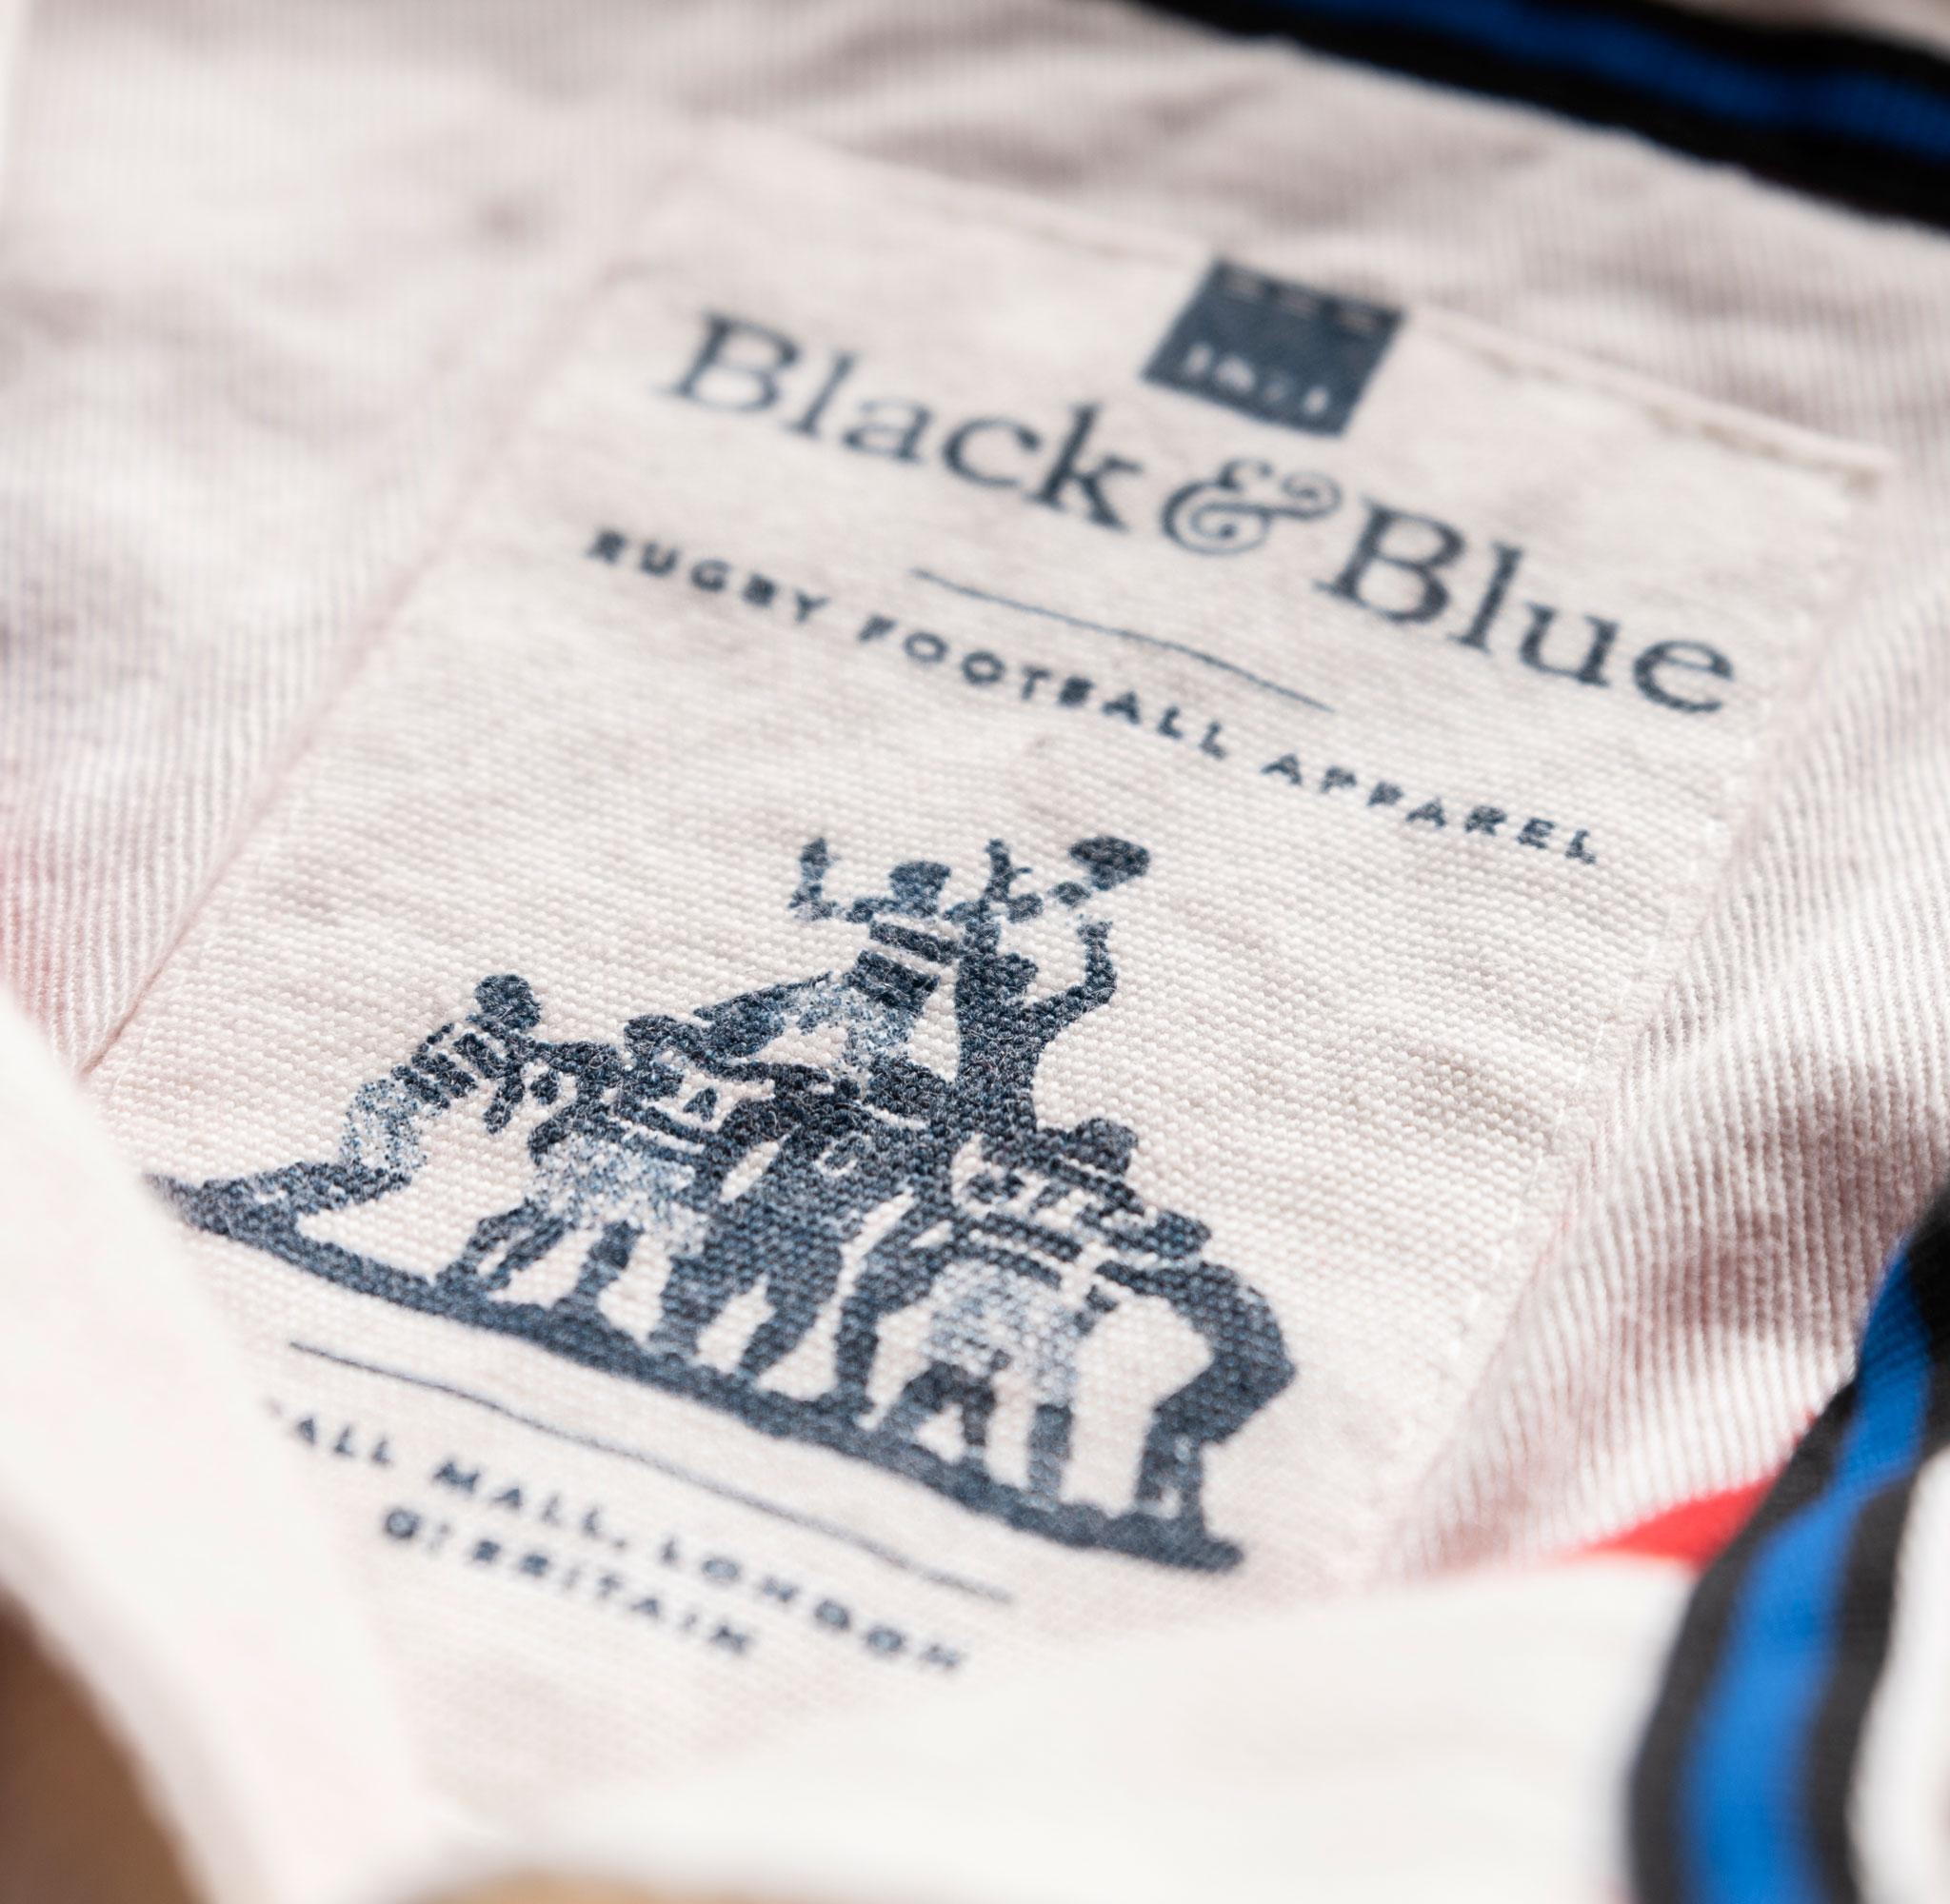 British and Irish Lions 1888 Rugby Shirt_BB Label